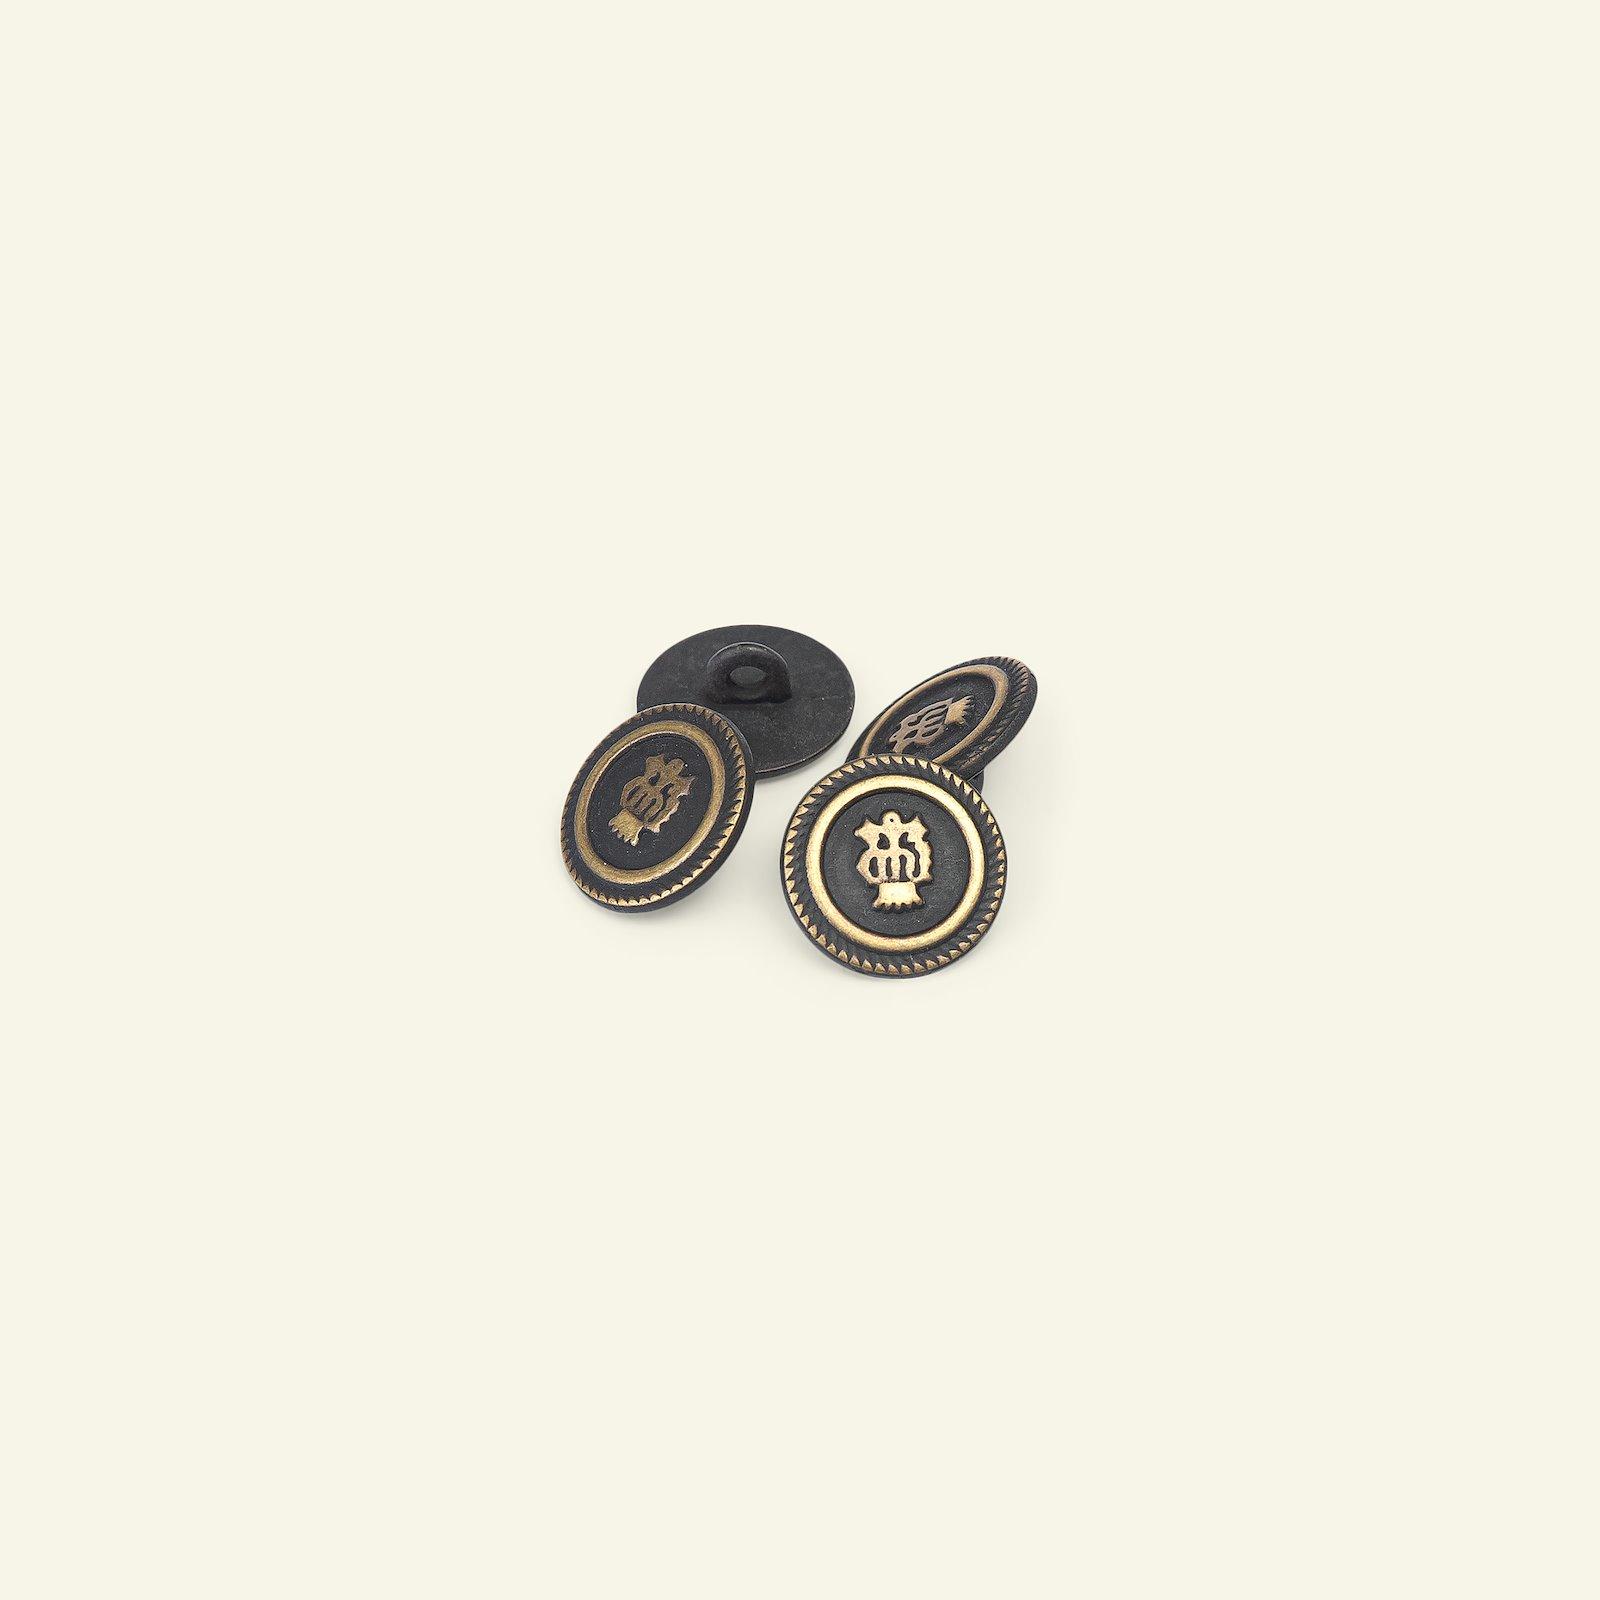 Shank button metal 14mm black/gold 4pcs 33597_pack